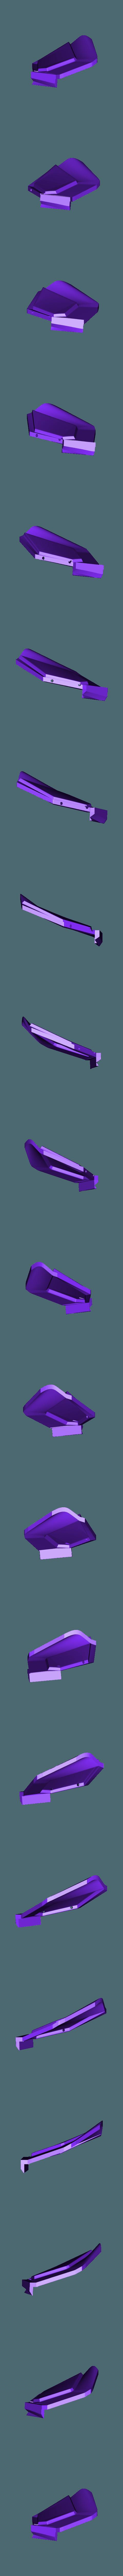 cheek right.stl Download STL file Iron Man Mark 42  • 3D printing object, SKUPERDIY